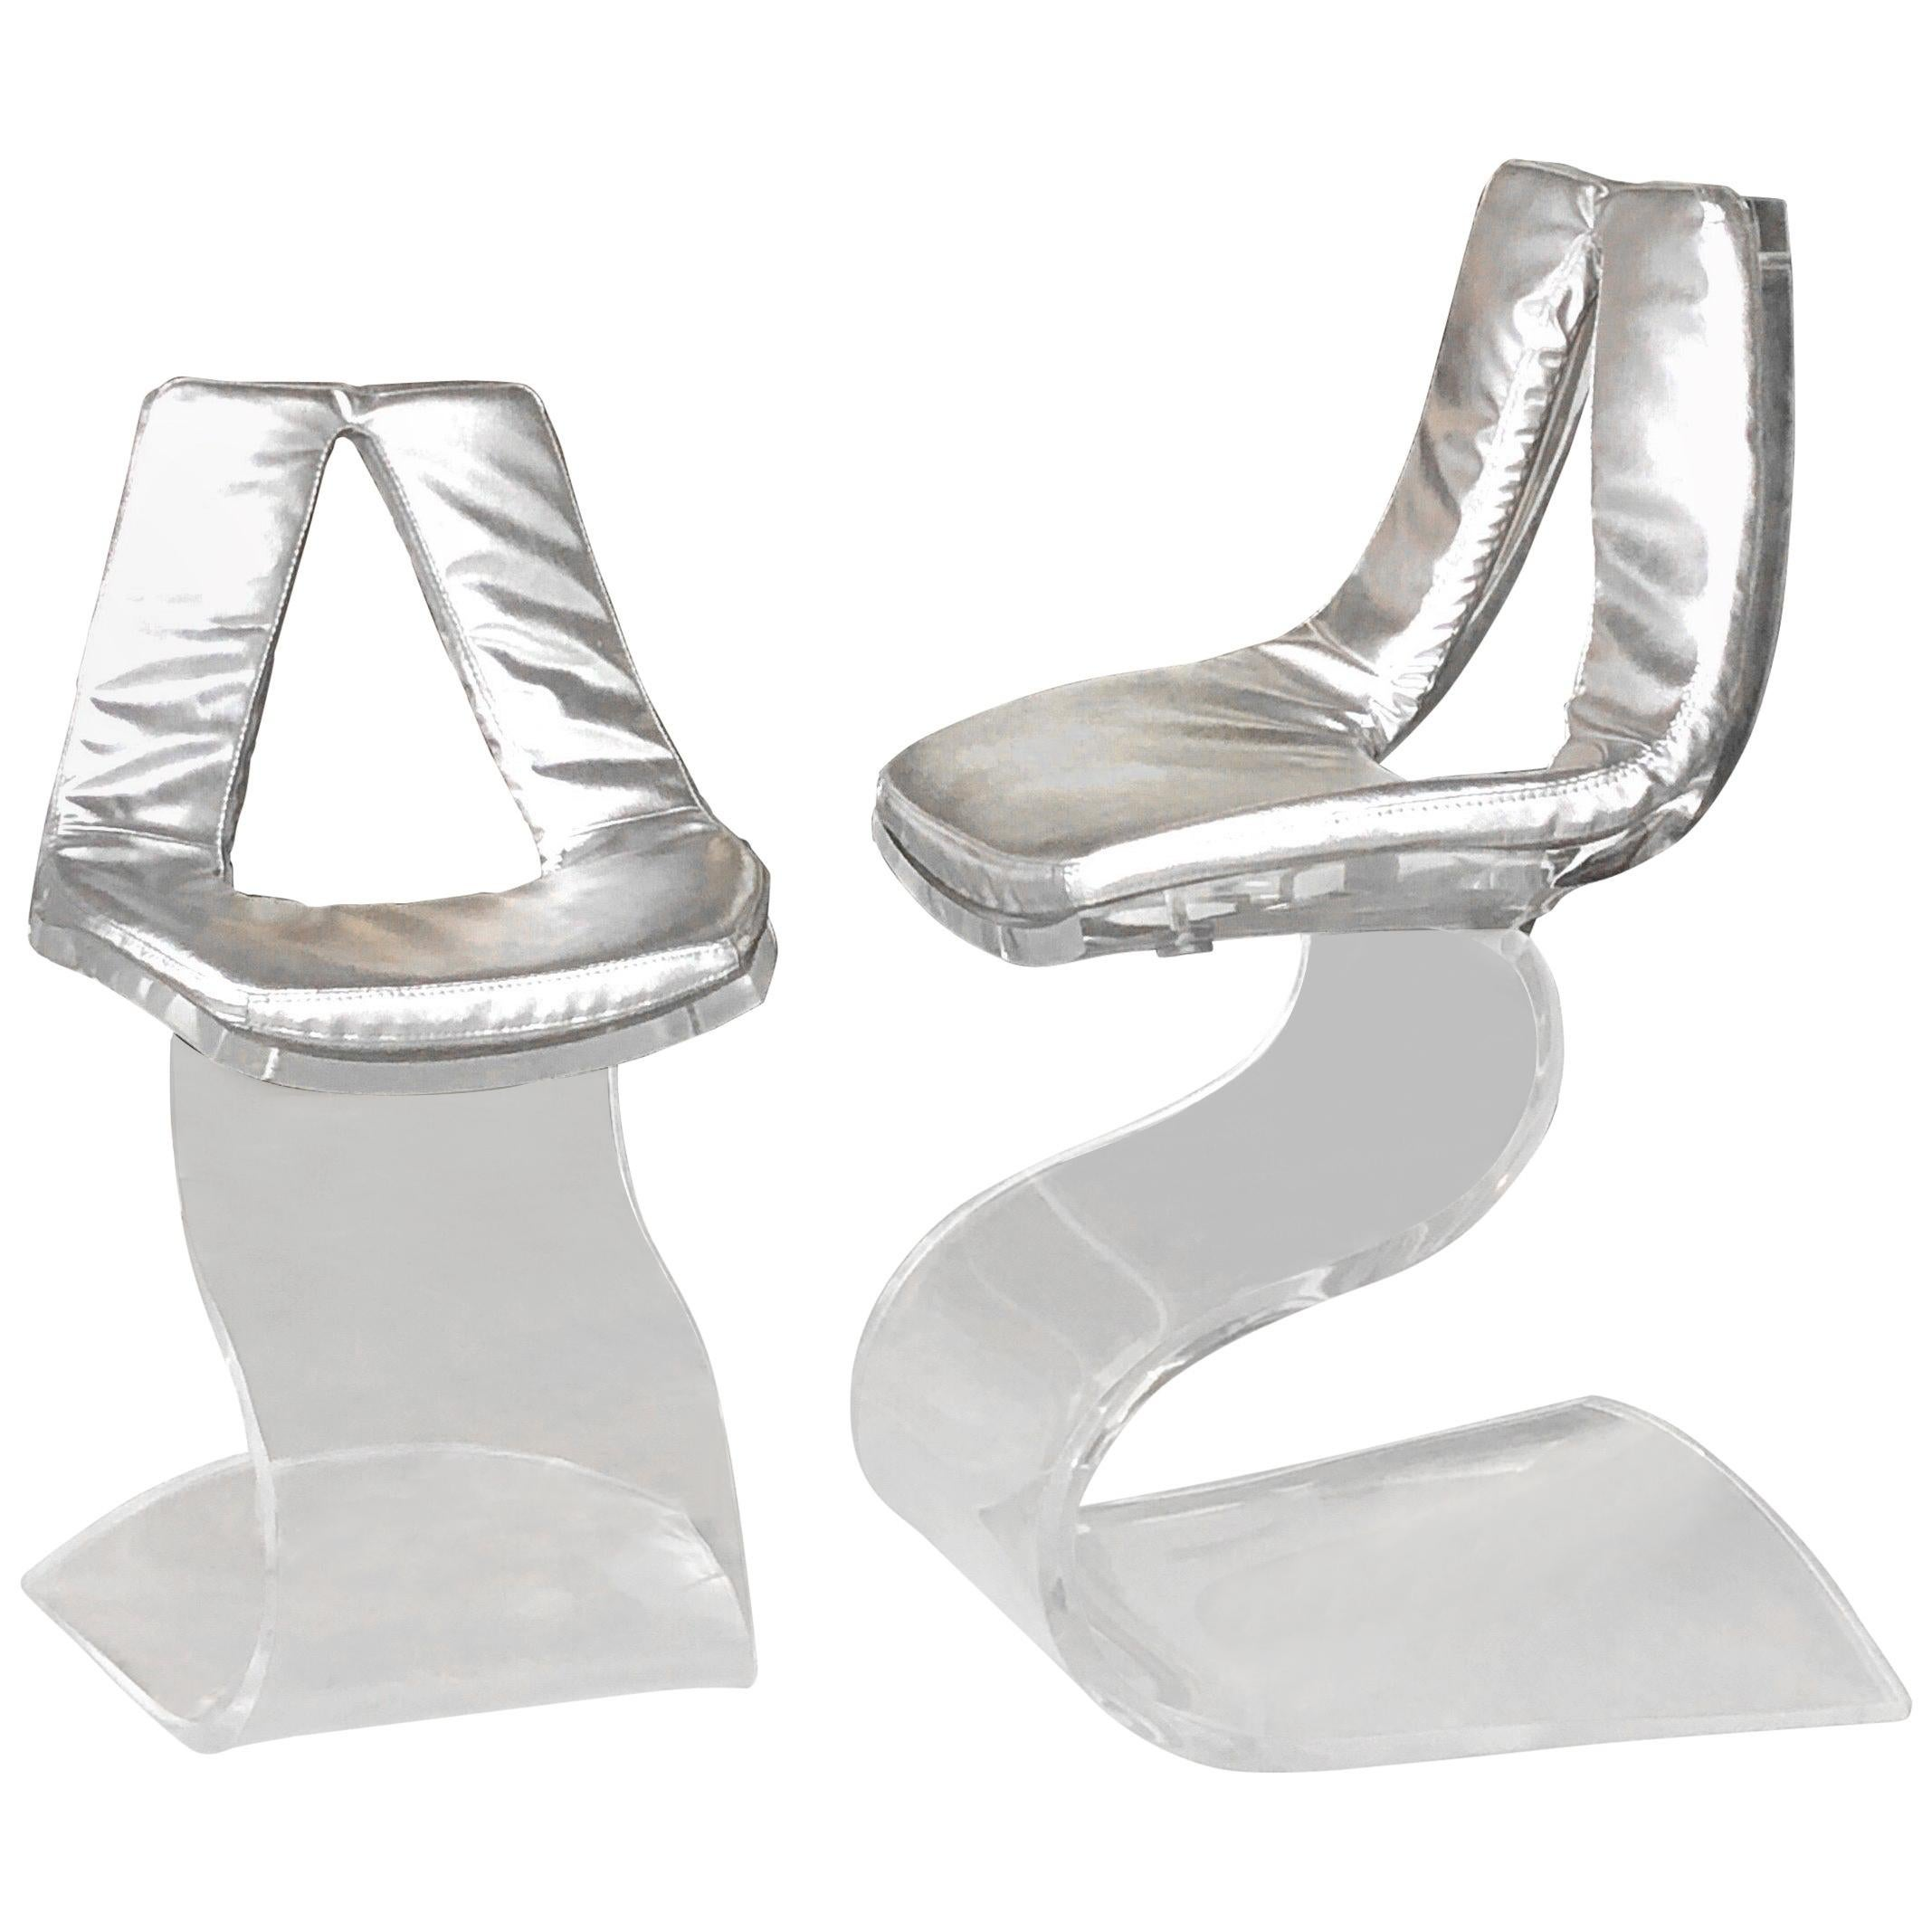 Boris Tabacoff Pair of Dumas Chairs with Original Silver Upholstery, 1970